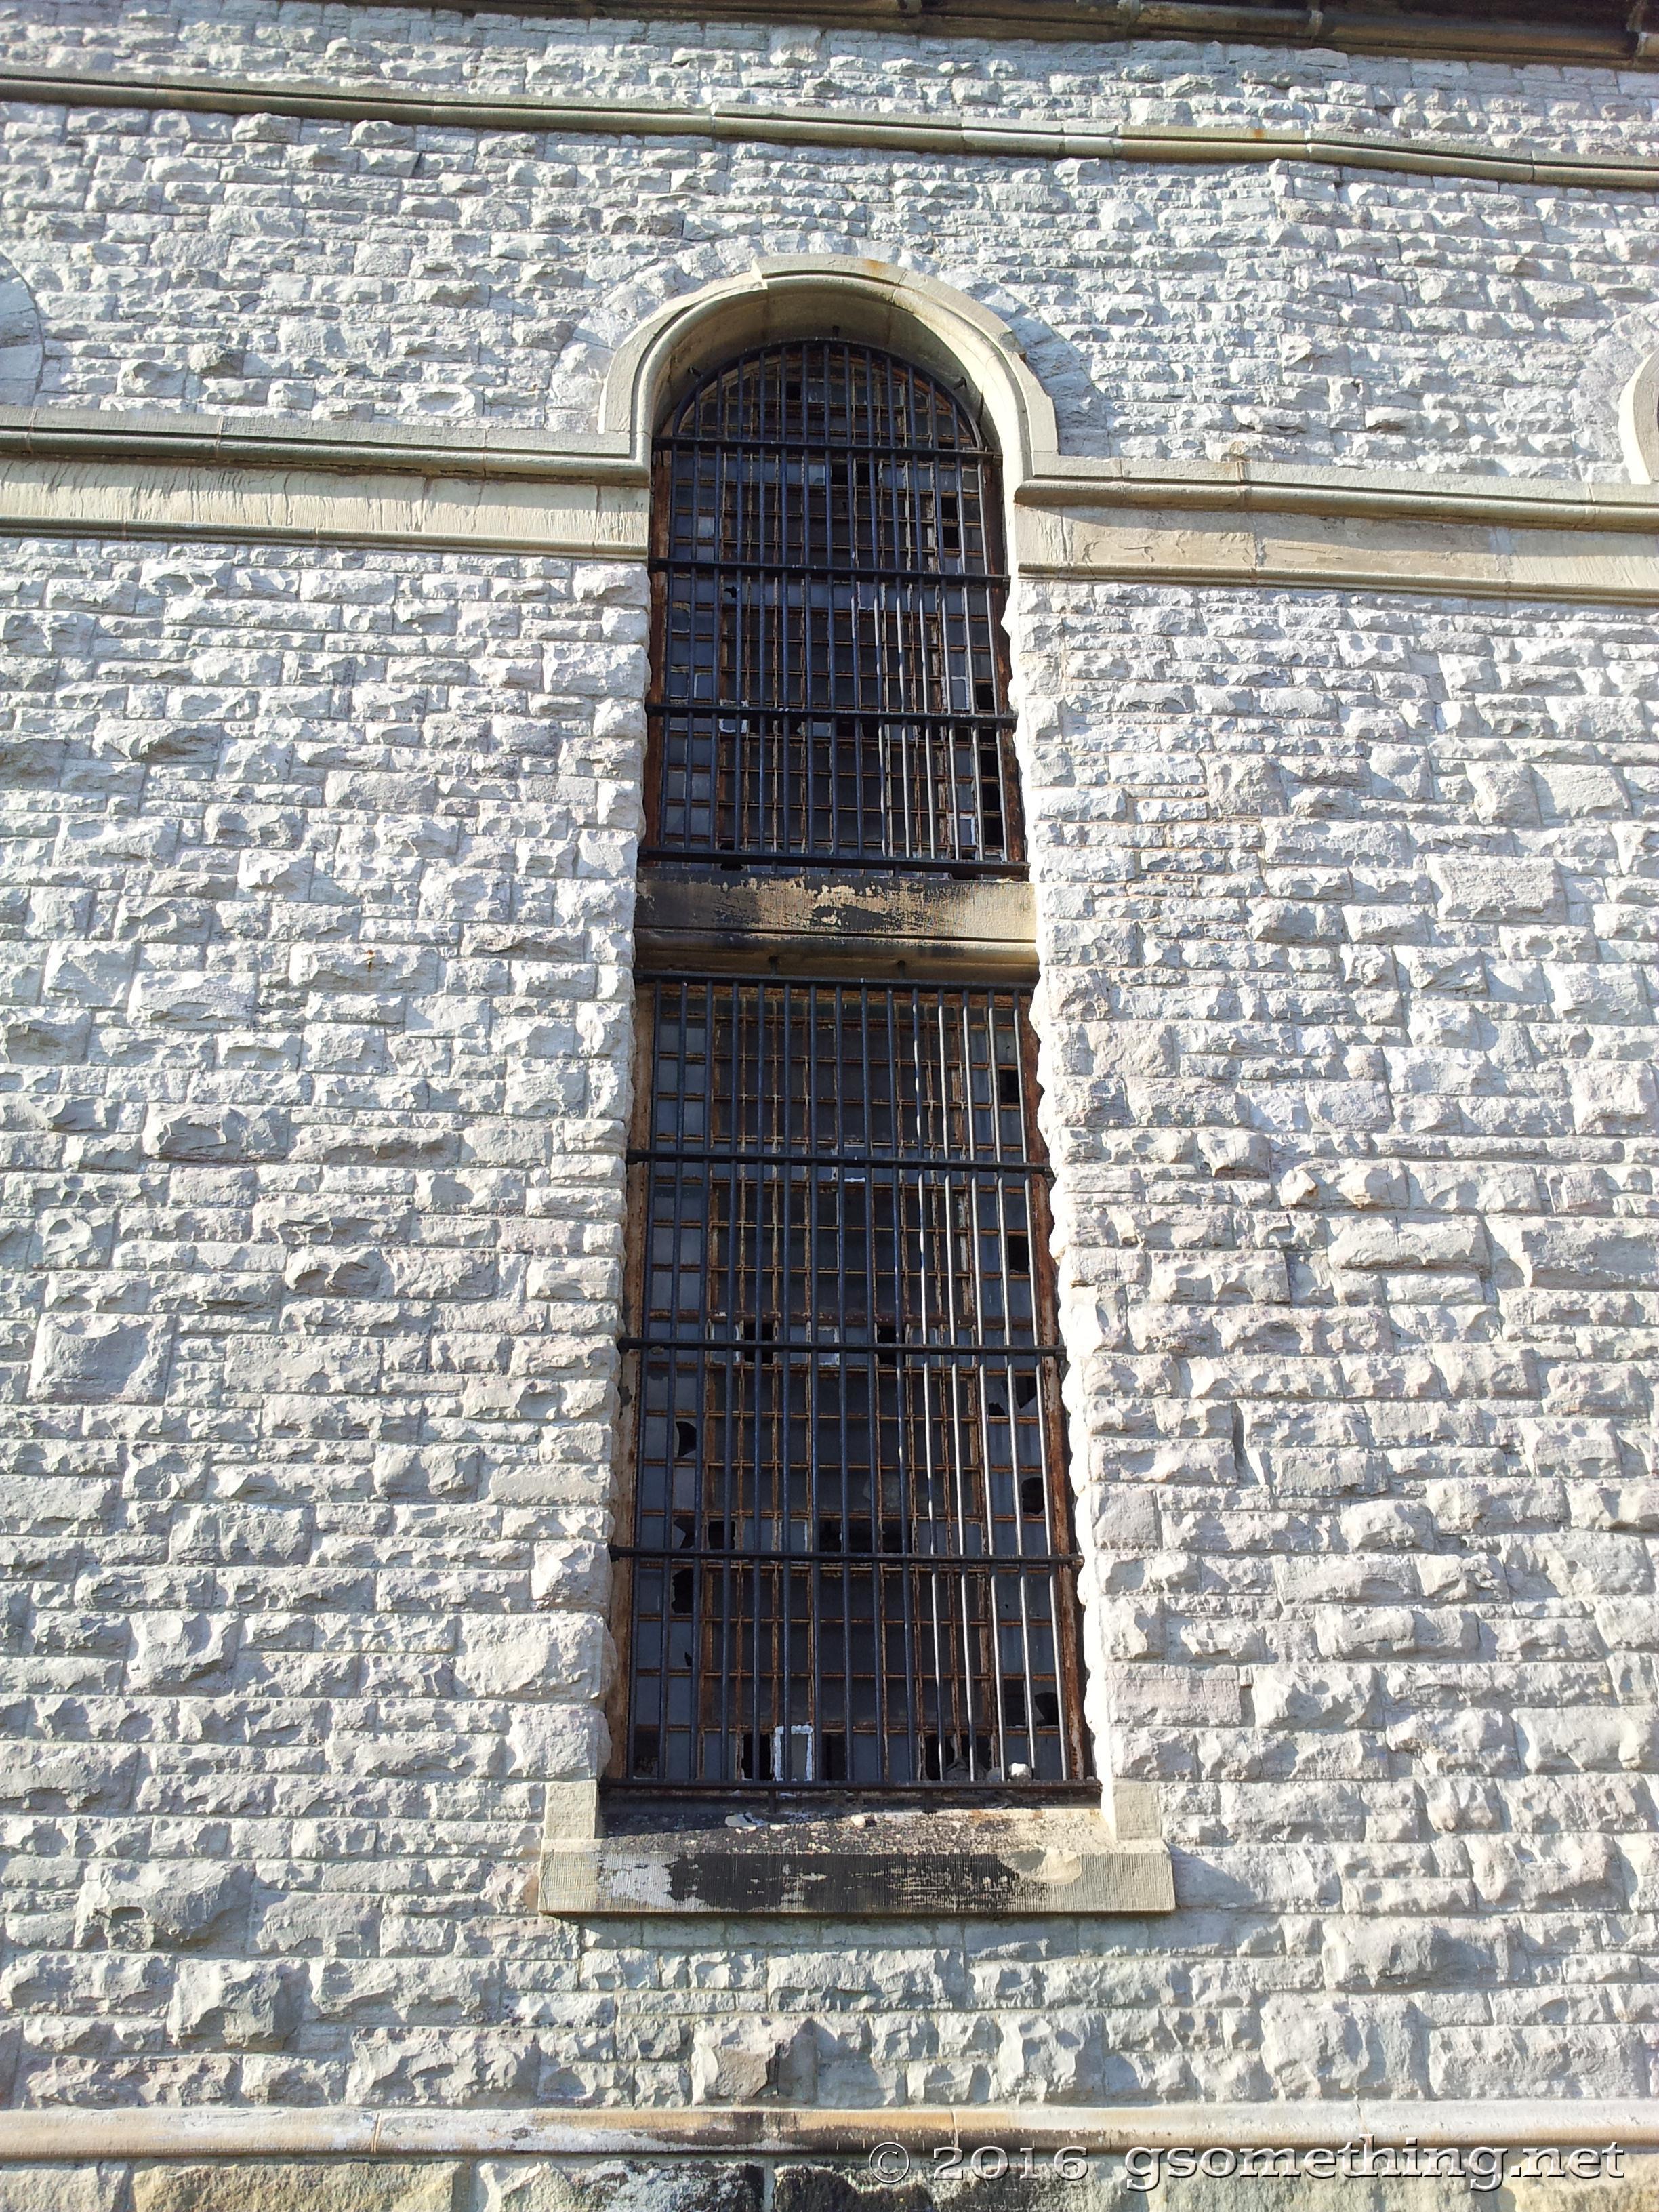 mansfield_reformatory_1st_trip_51.jpg